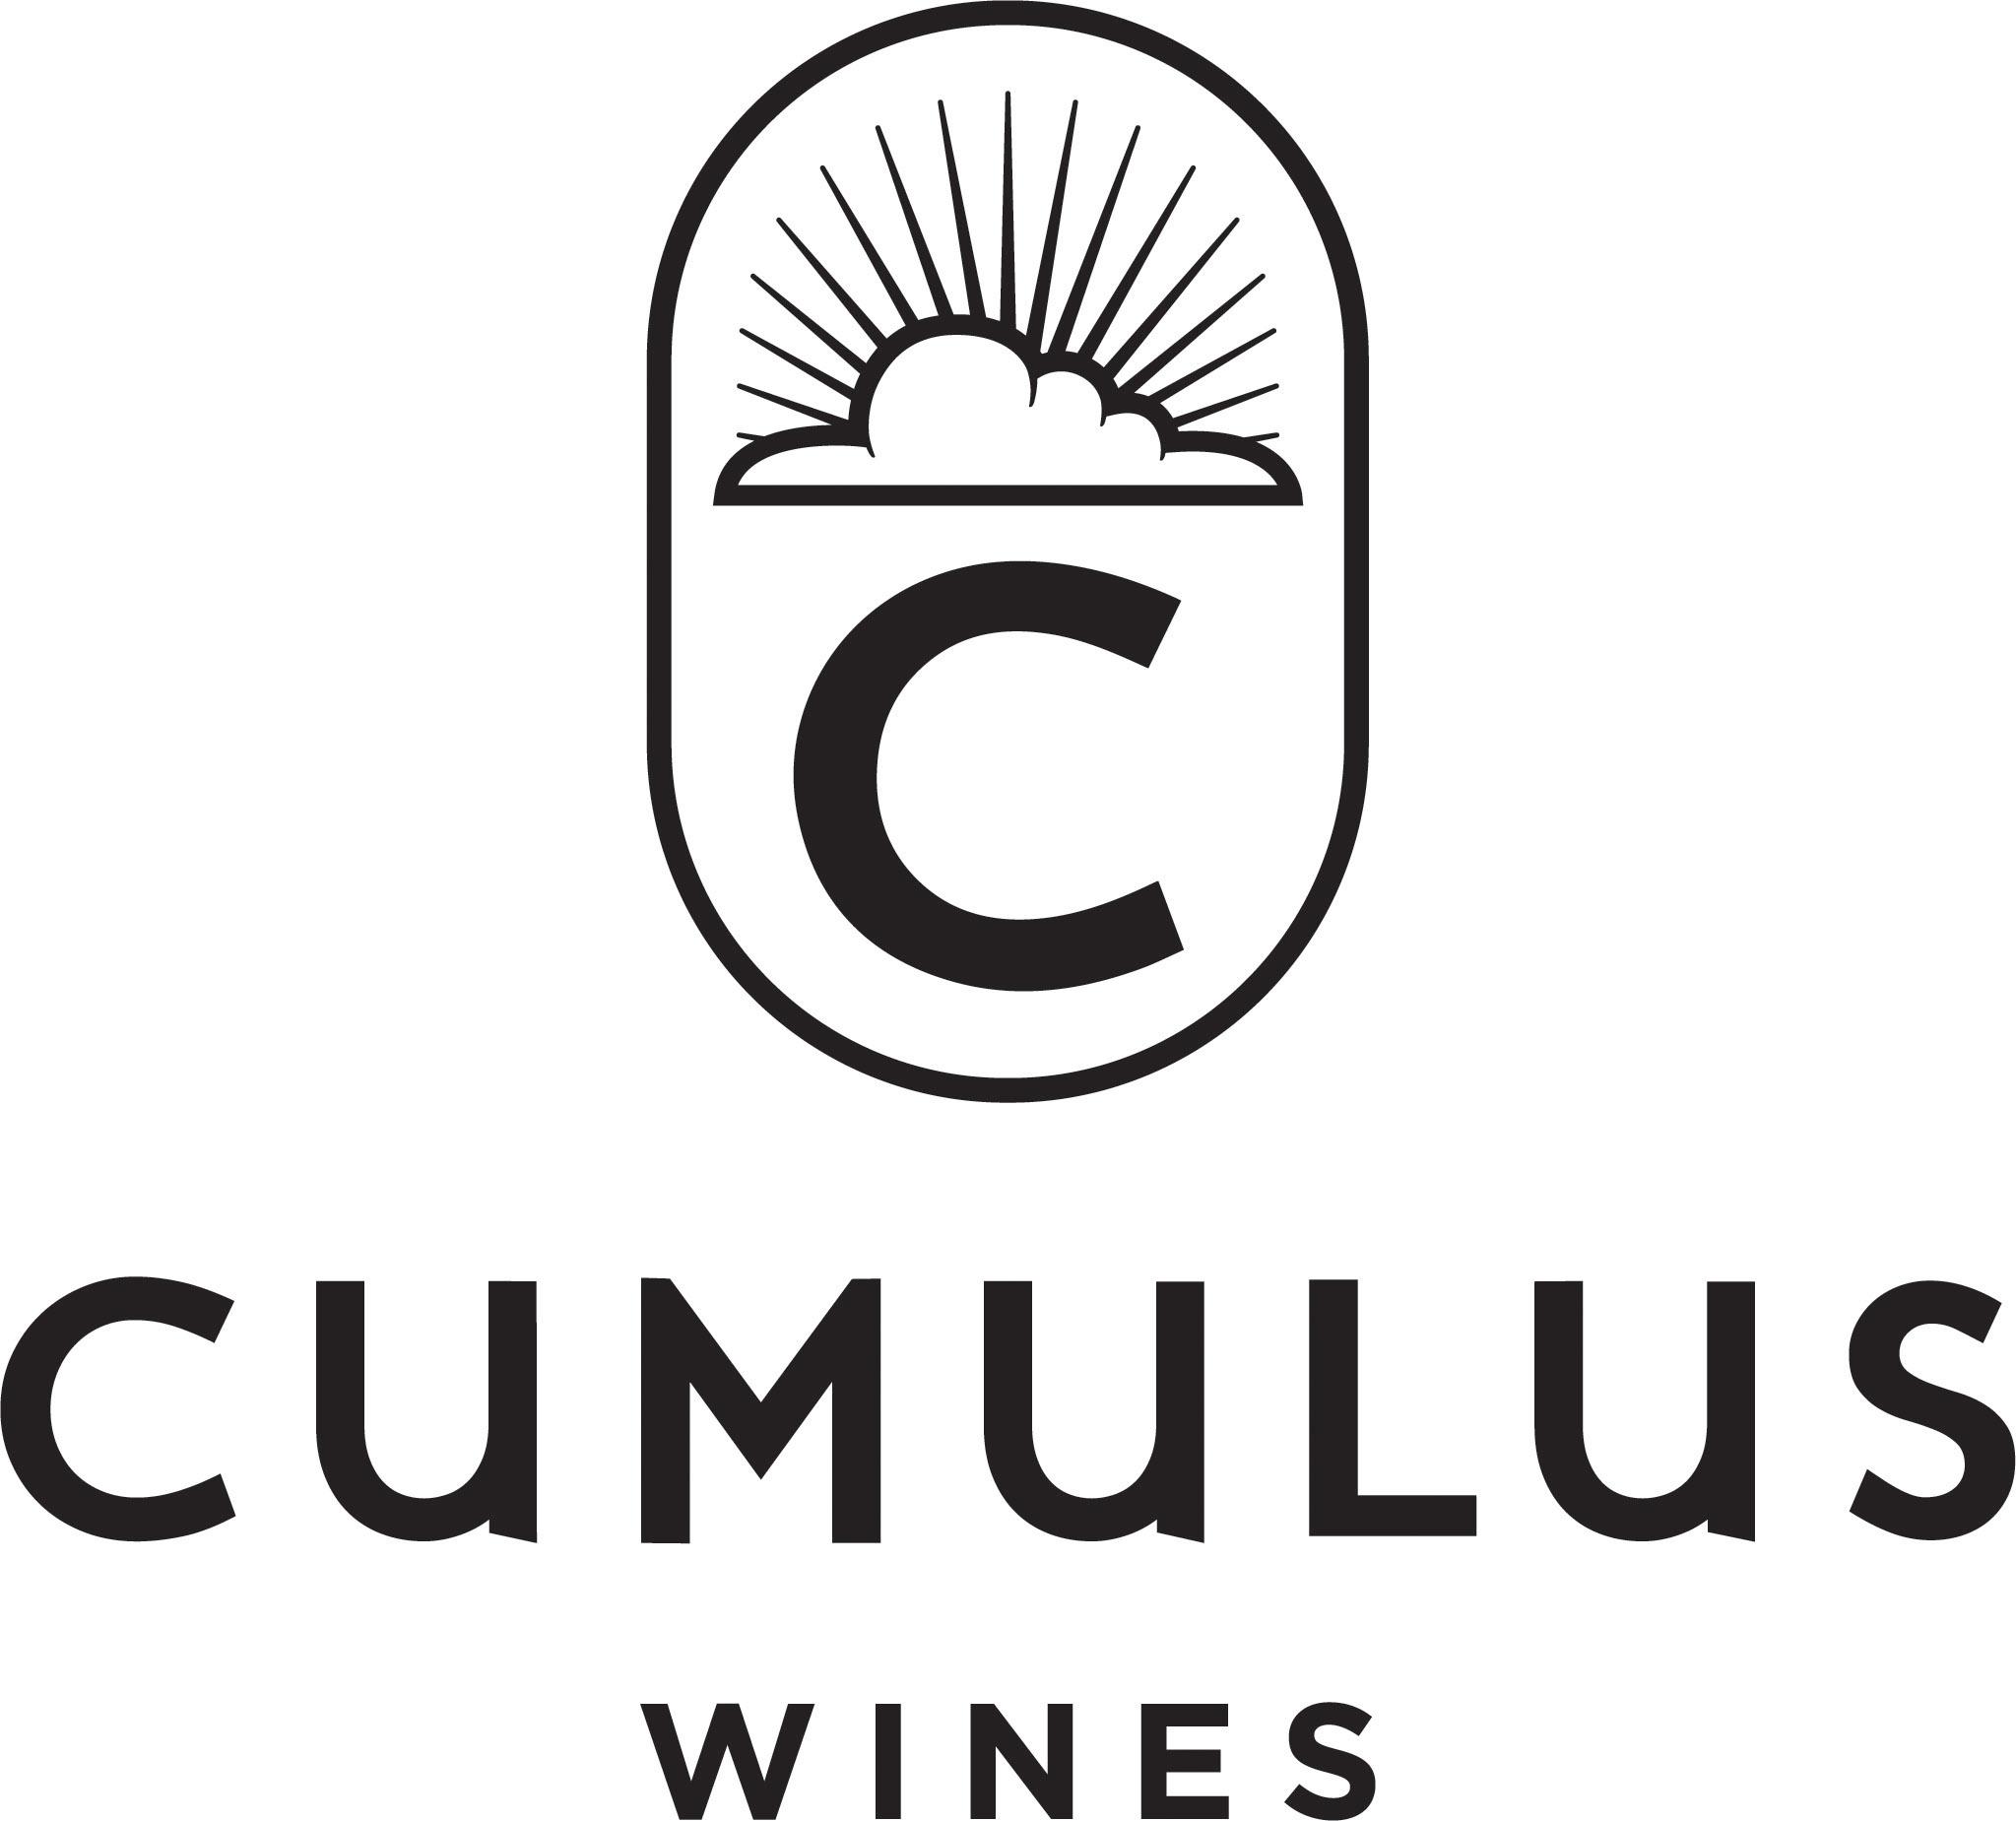 Cumulus Wines Logotype Stacked.jpg